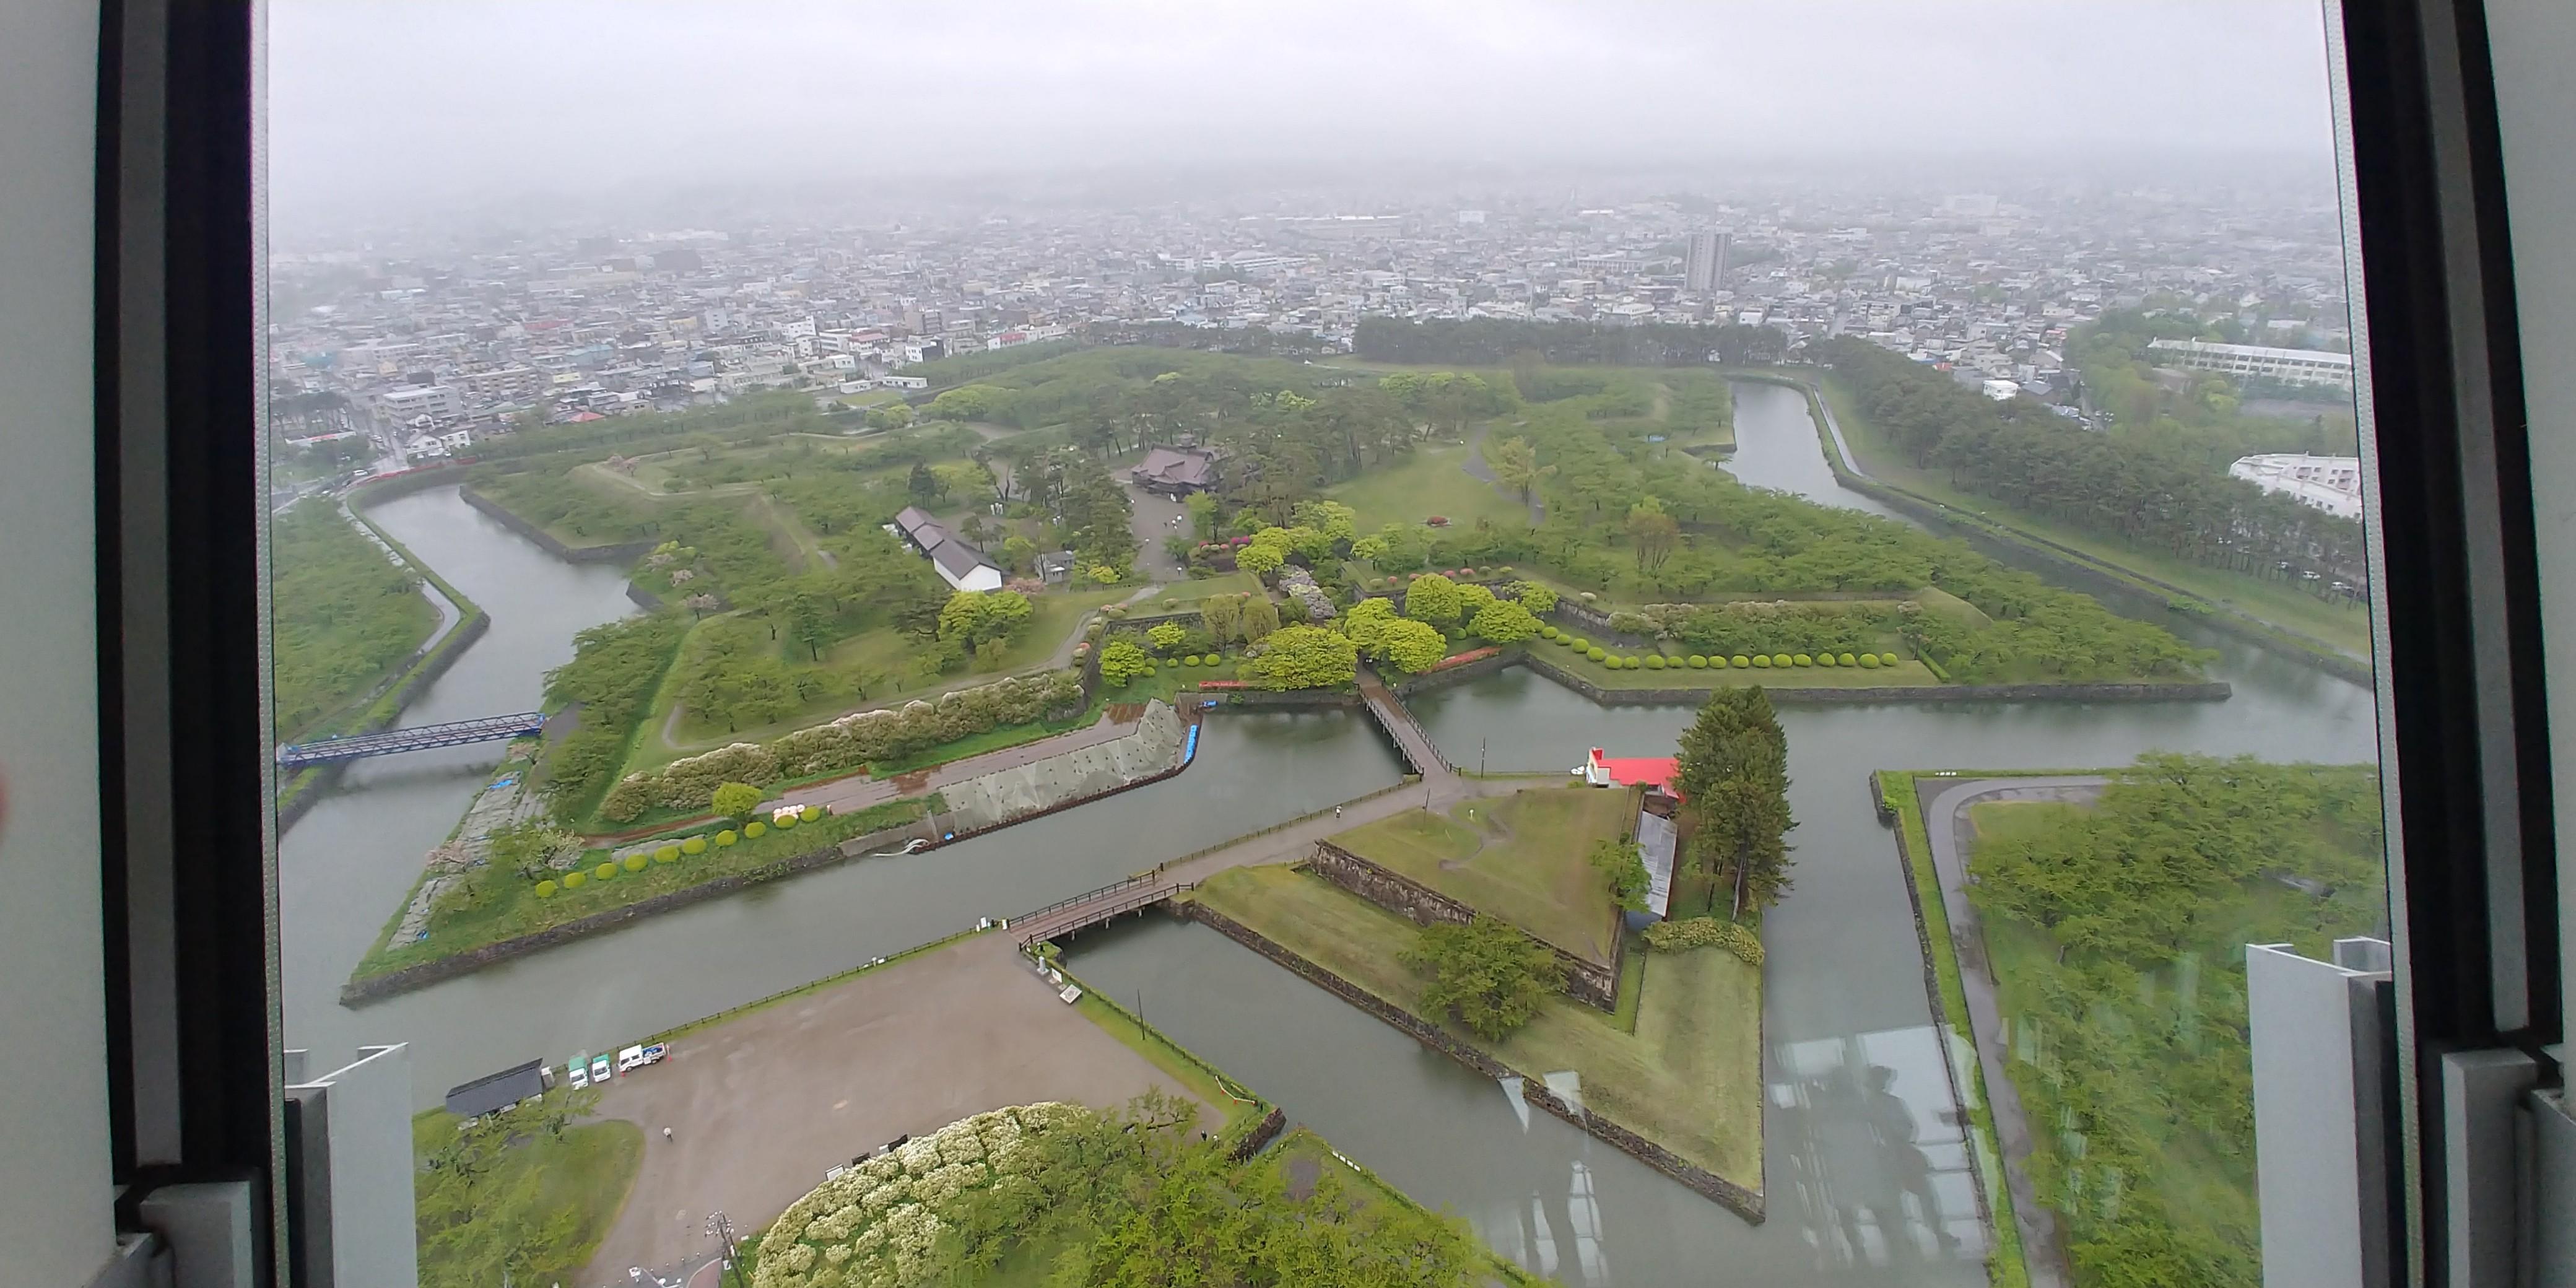 f:id:kishuji-kaisoku:20190730035826j:image